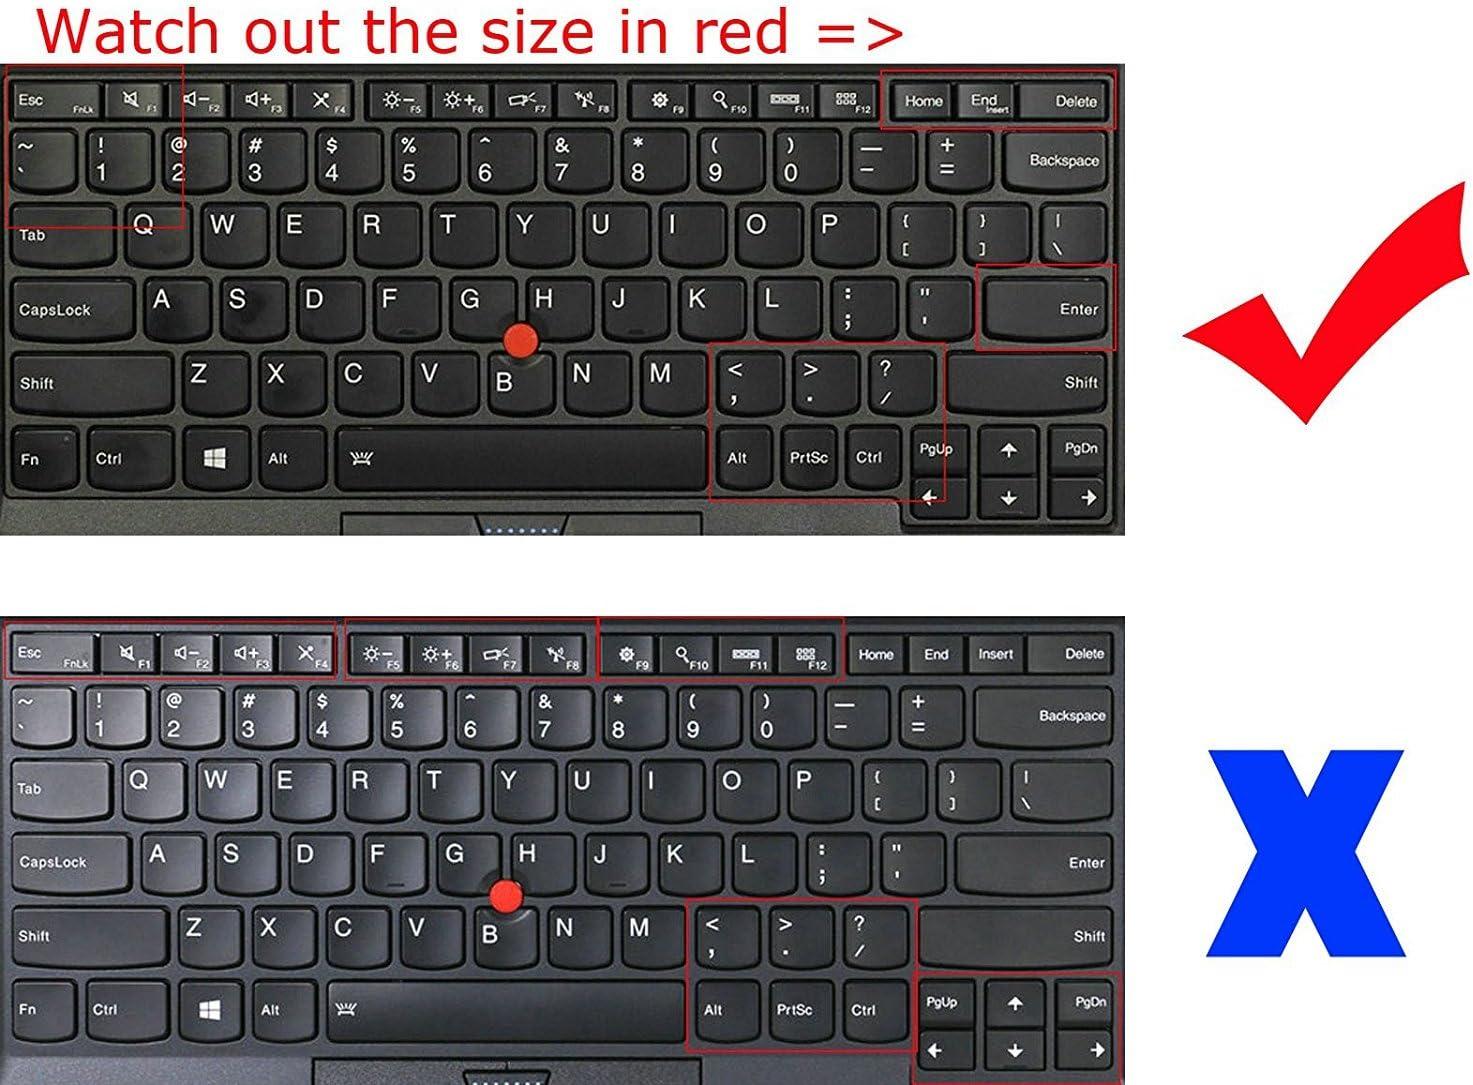 BingoBuy Semi-Black US Layout Silicone Keyboard Protector Skin Cover for Lenovo ThinkPad X230s X240 X240s X250 X260 X270 X280 X380 X390 X395 Yoga S1 260 370 with BingoBuy Card Case